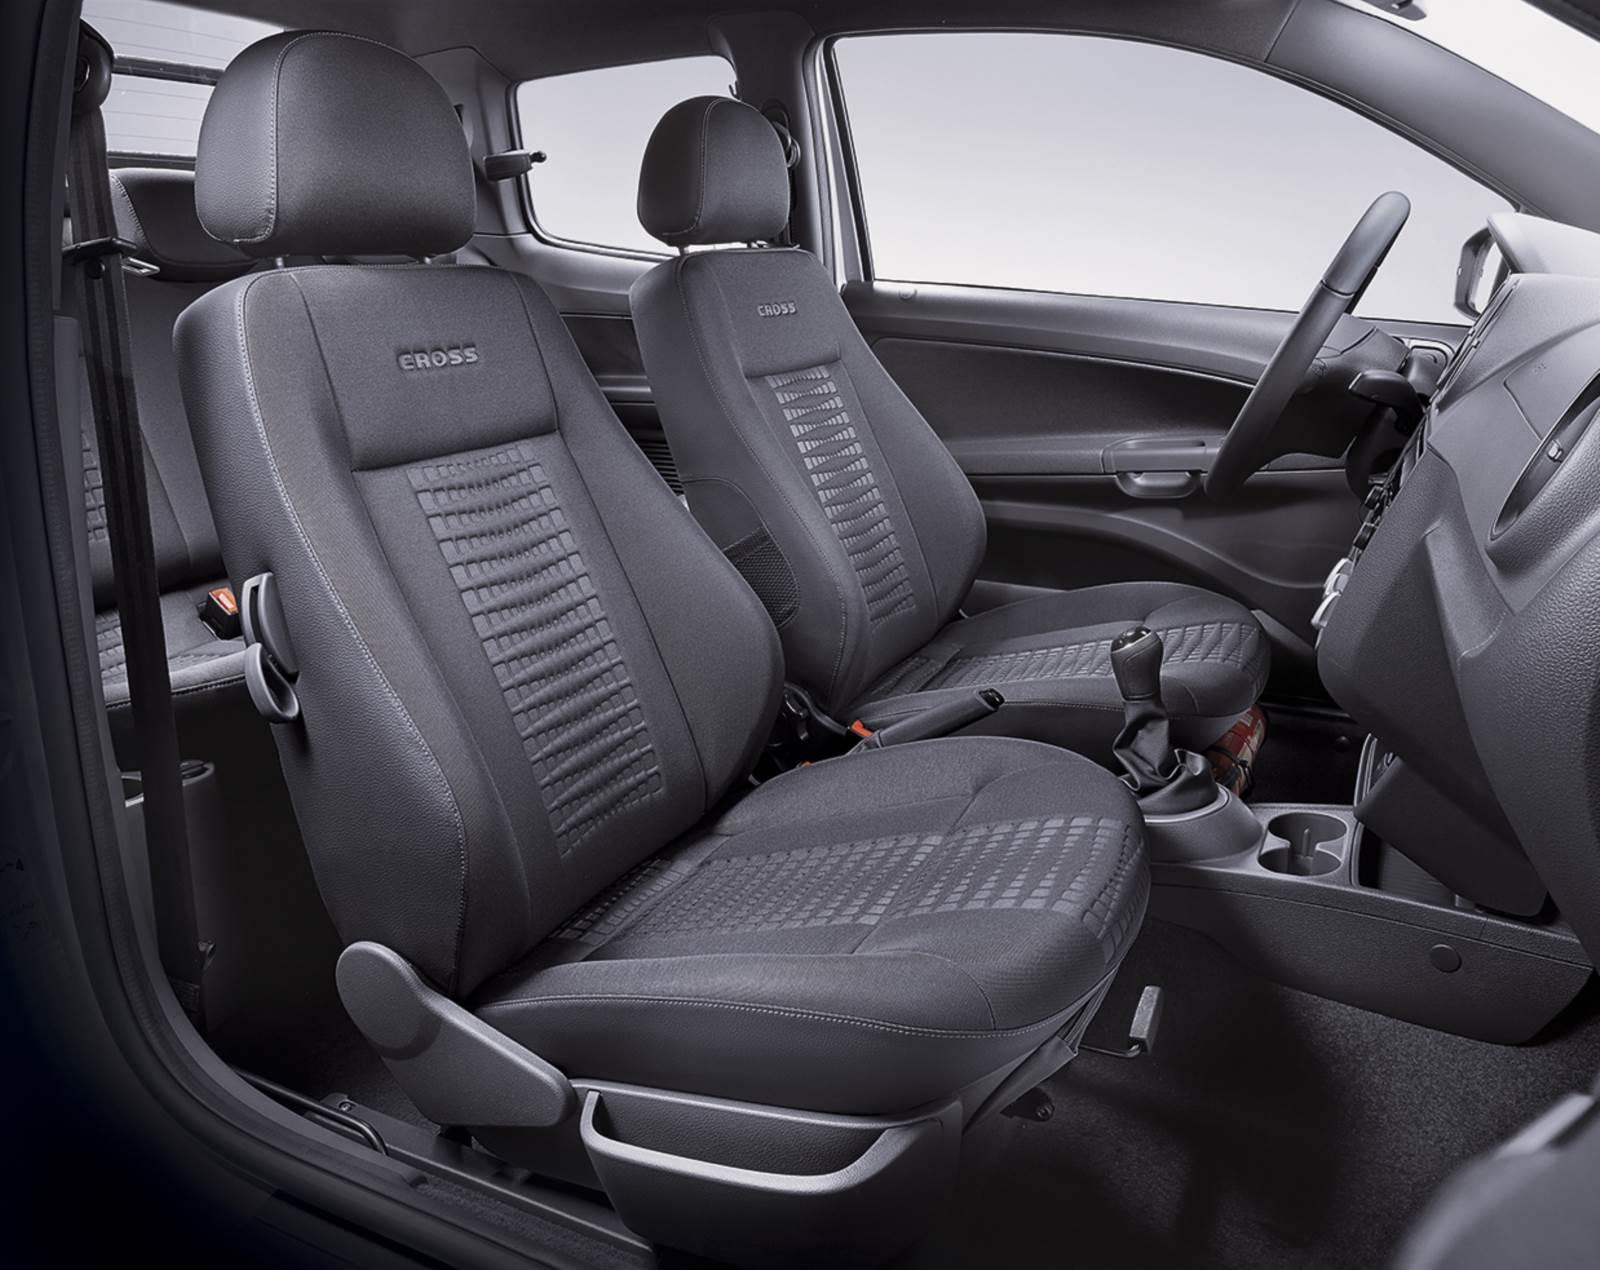 VW Saveiro Cabine Dupla 2015 Cross - interior